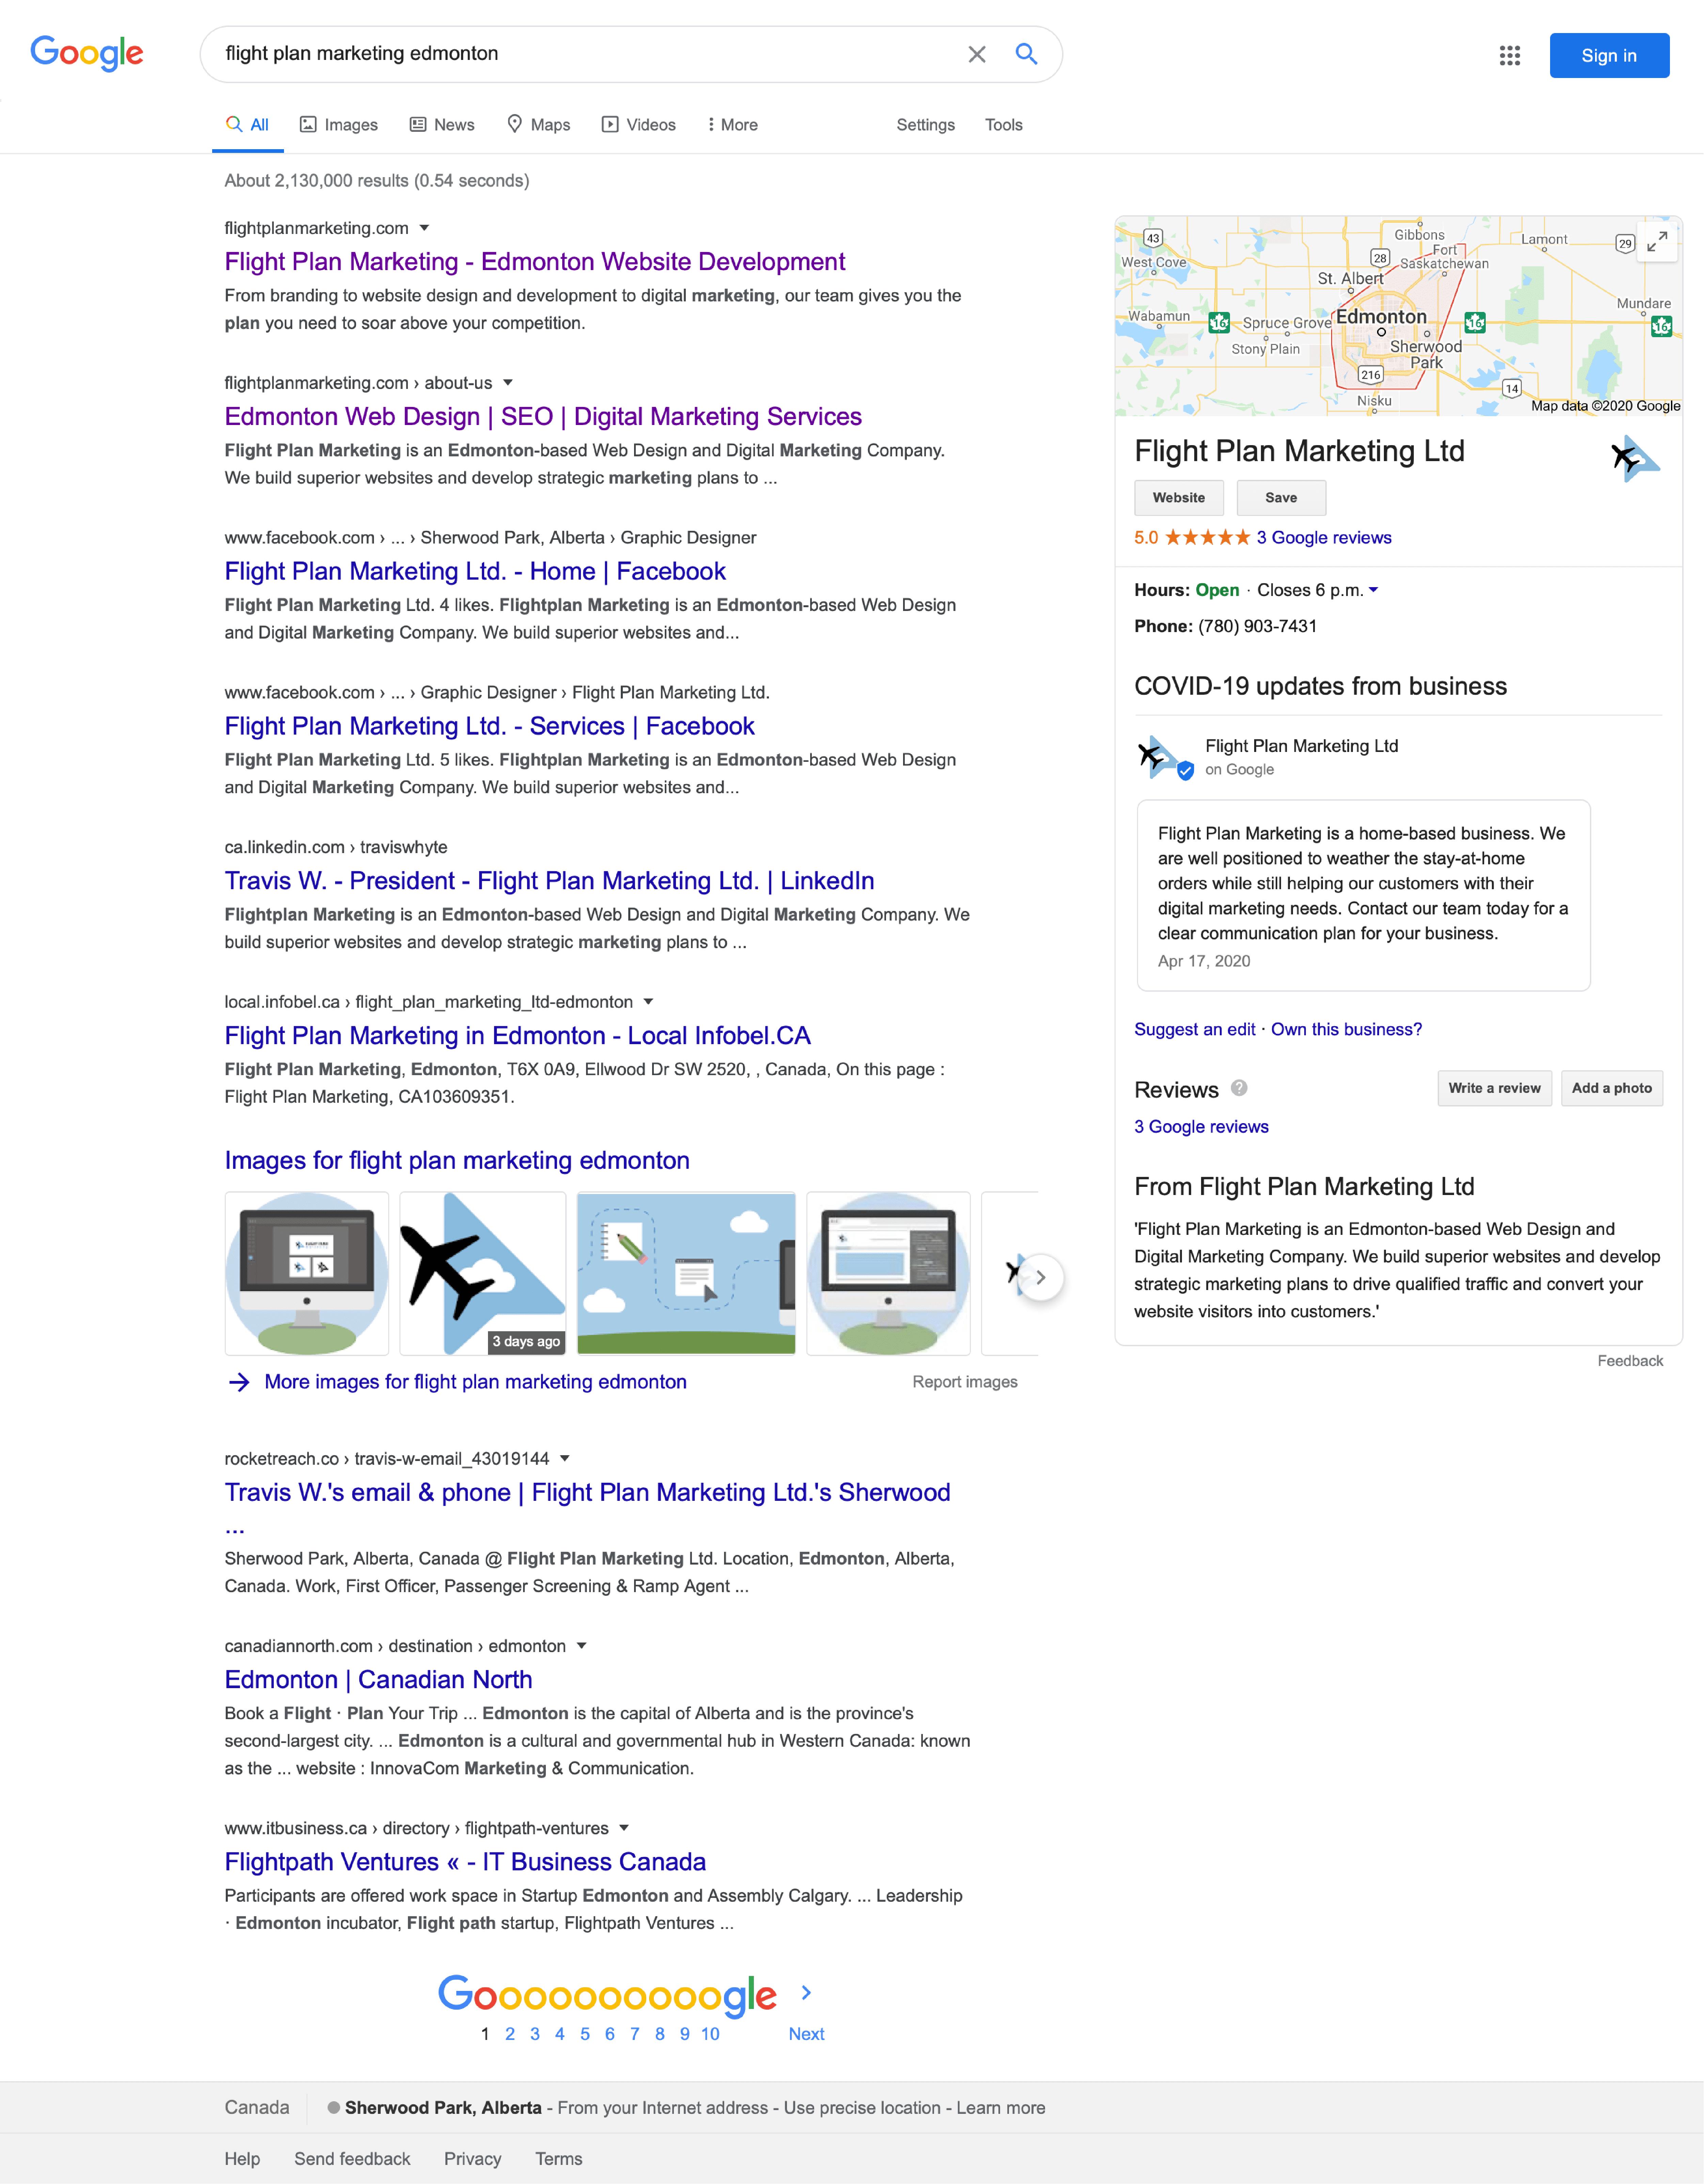 flight plan marketing google brand search results